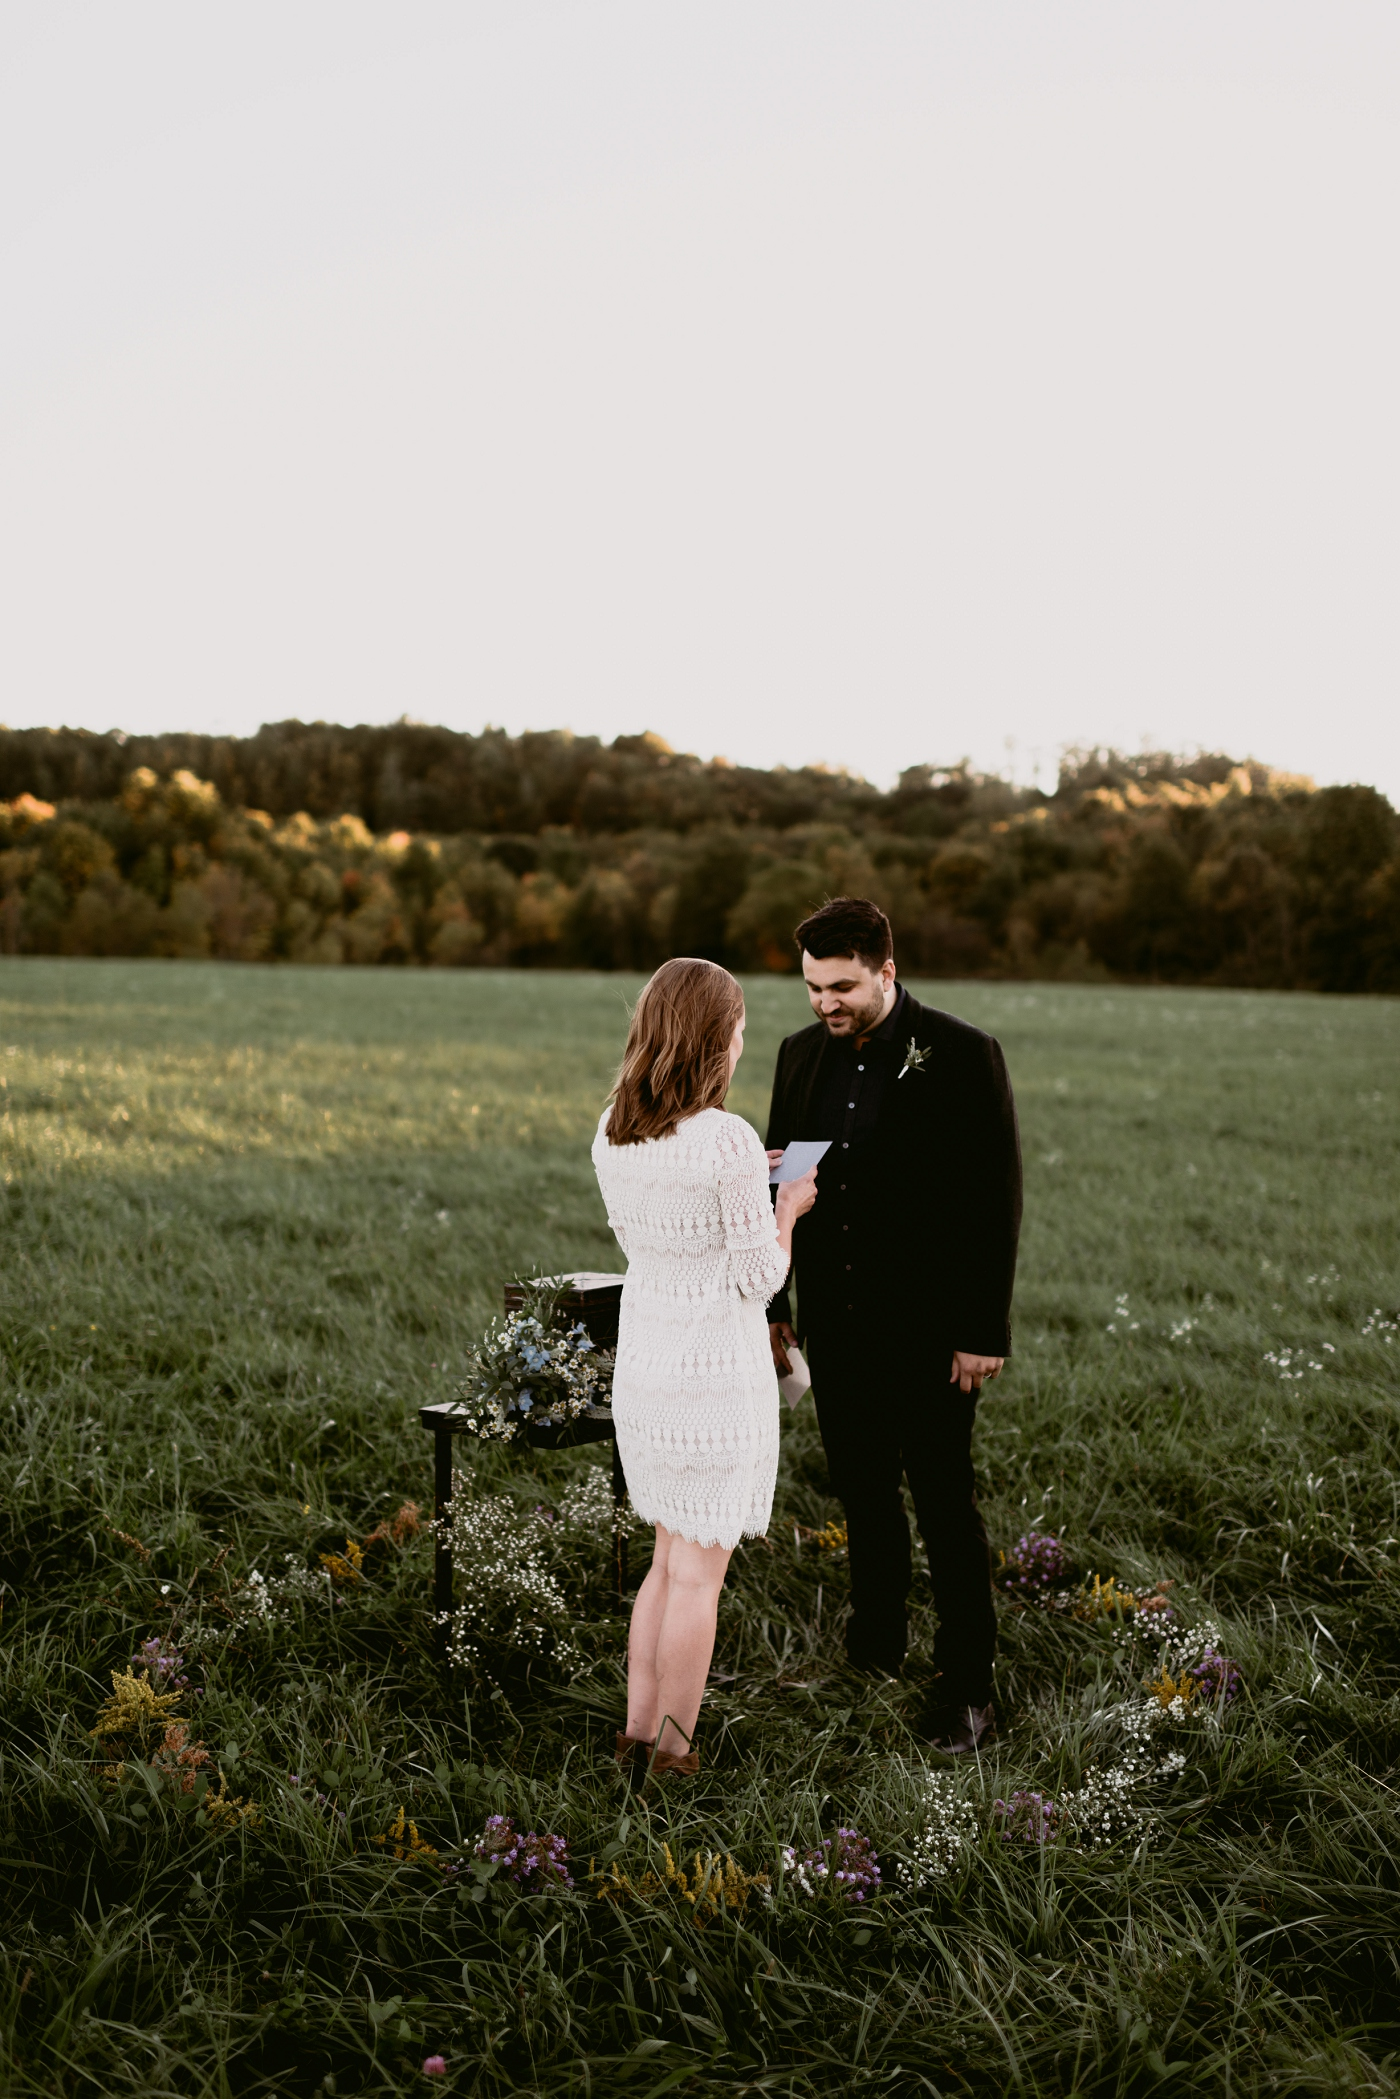 Wildflower-Field-Elopement-Vow-Renewal_Lisa+Chad_MJPHOTO-165.JPG